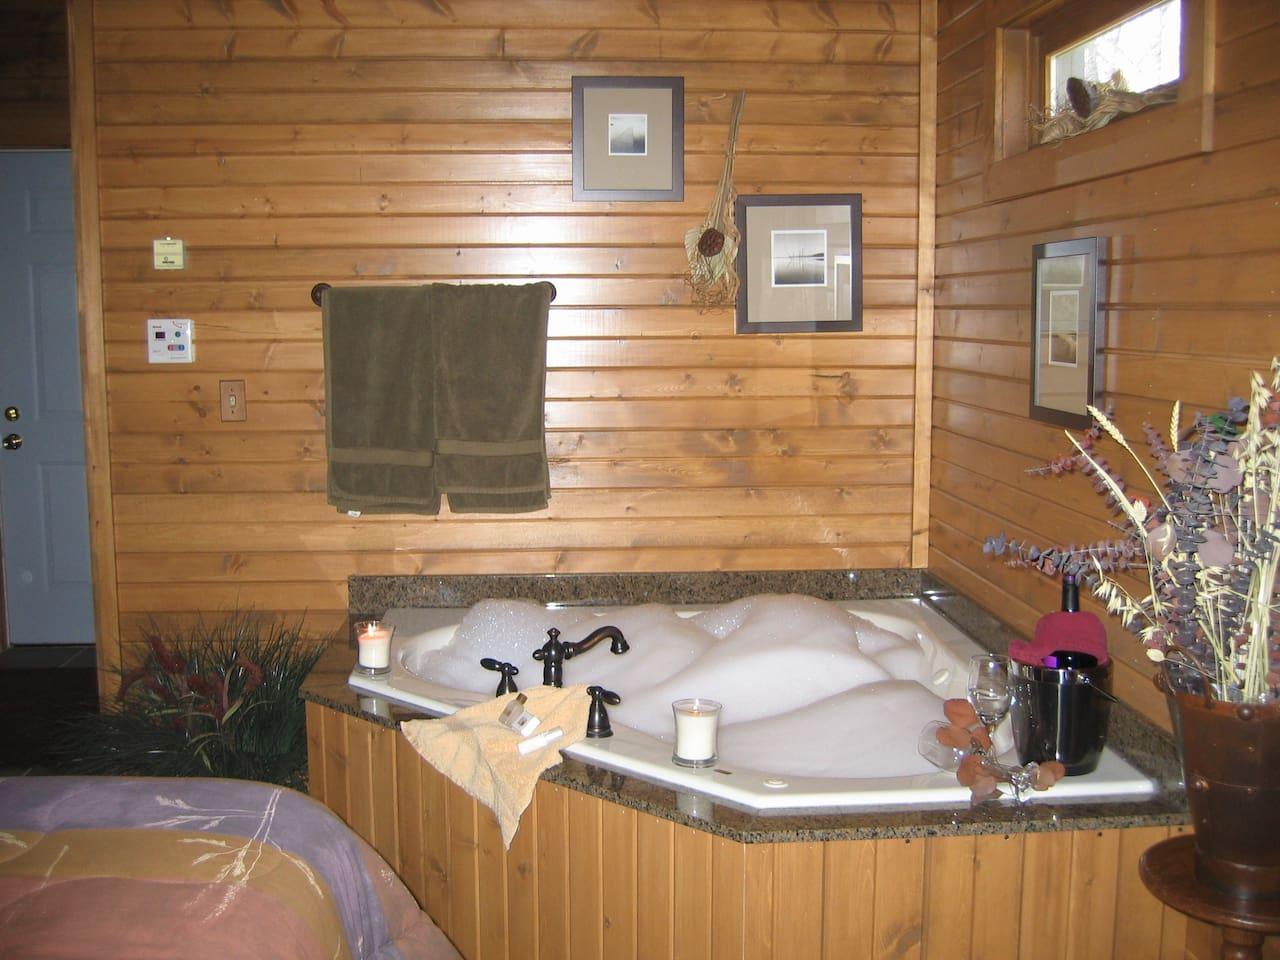 Luxury Cabin 2 person whirlpool tub